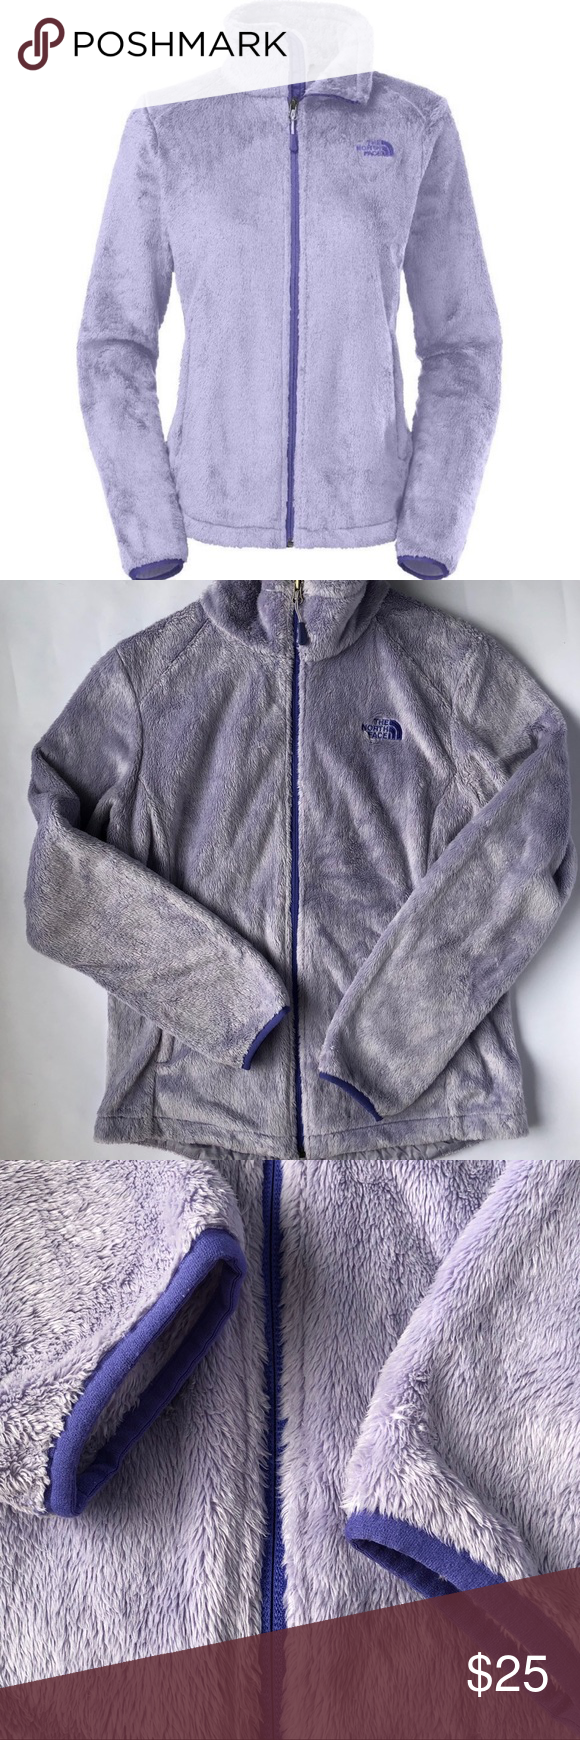 North Face Fuzzy Osito Jacket In Soft Purple M Clothes Design Soft Purple Fashion [ 1740 x 580 Pixel ]